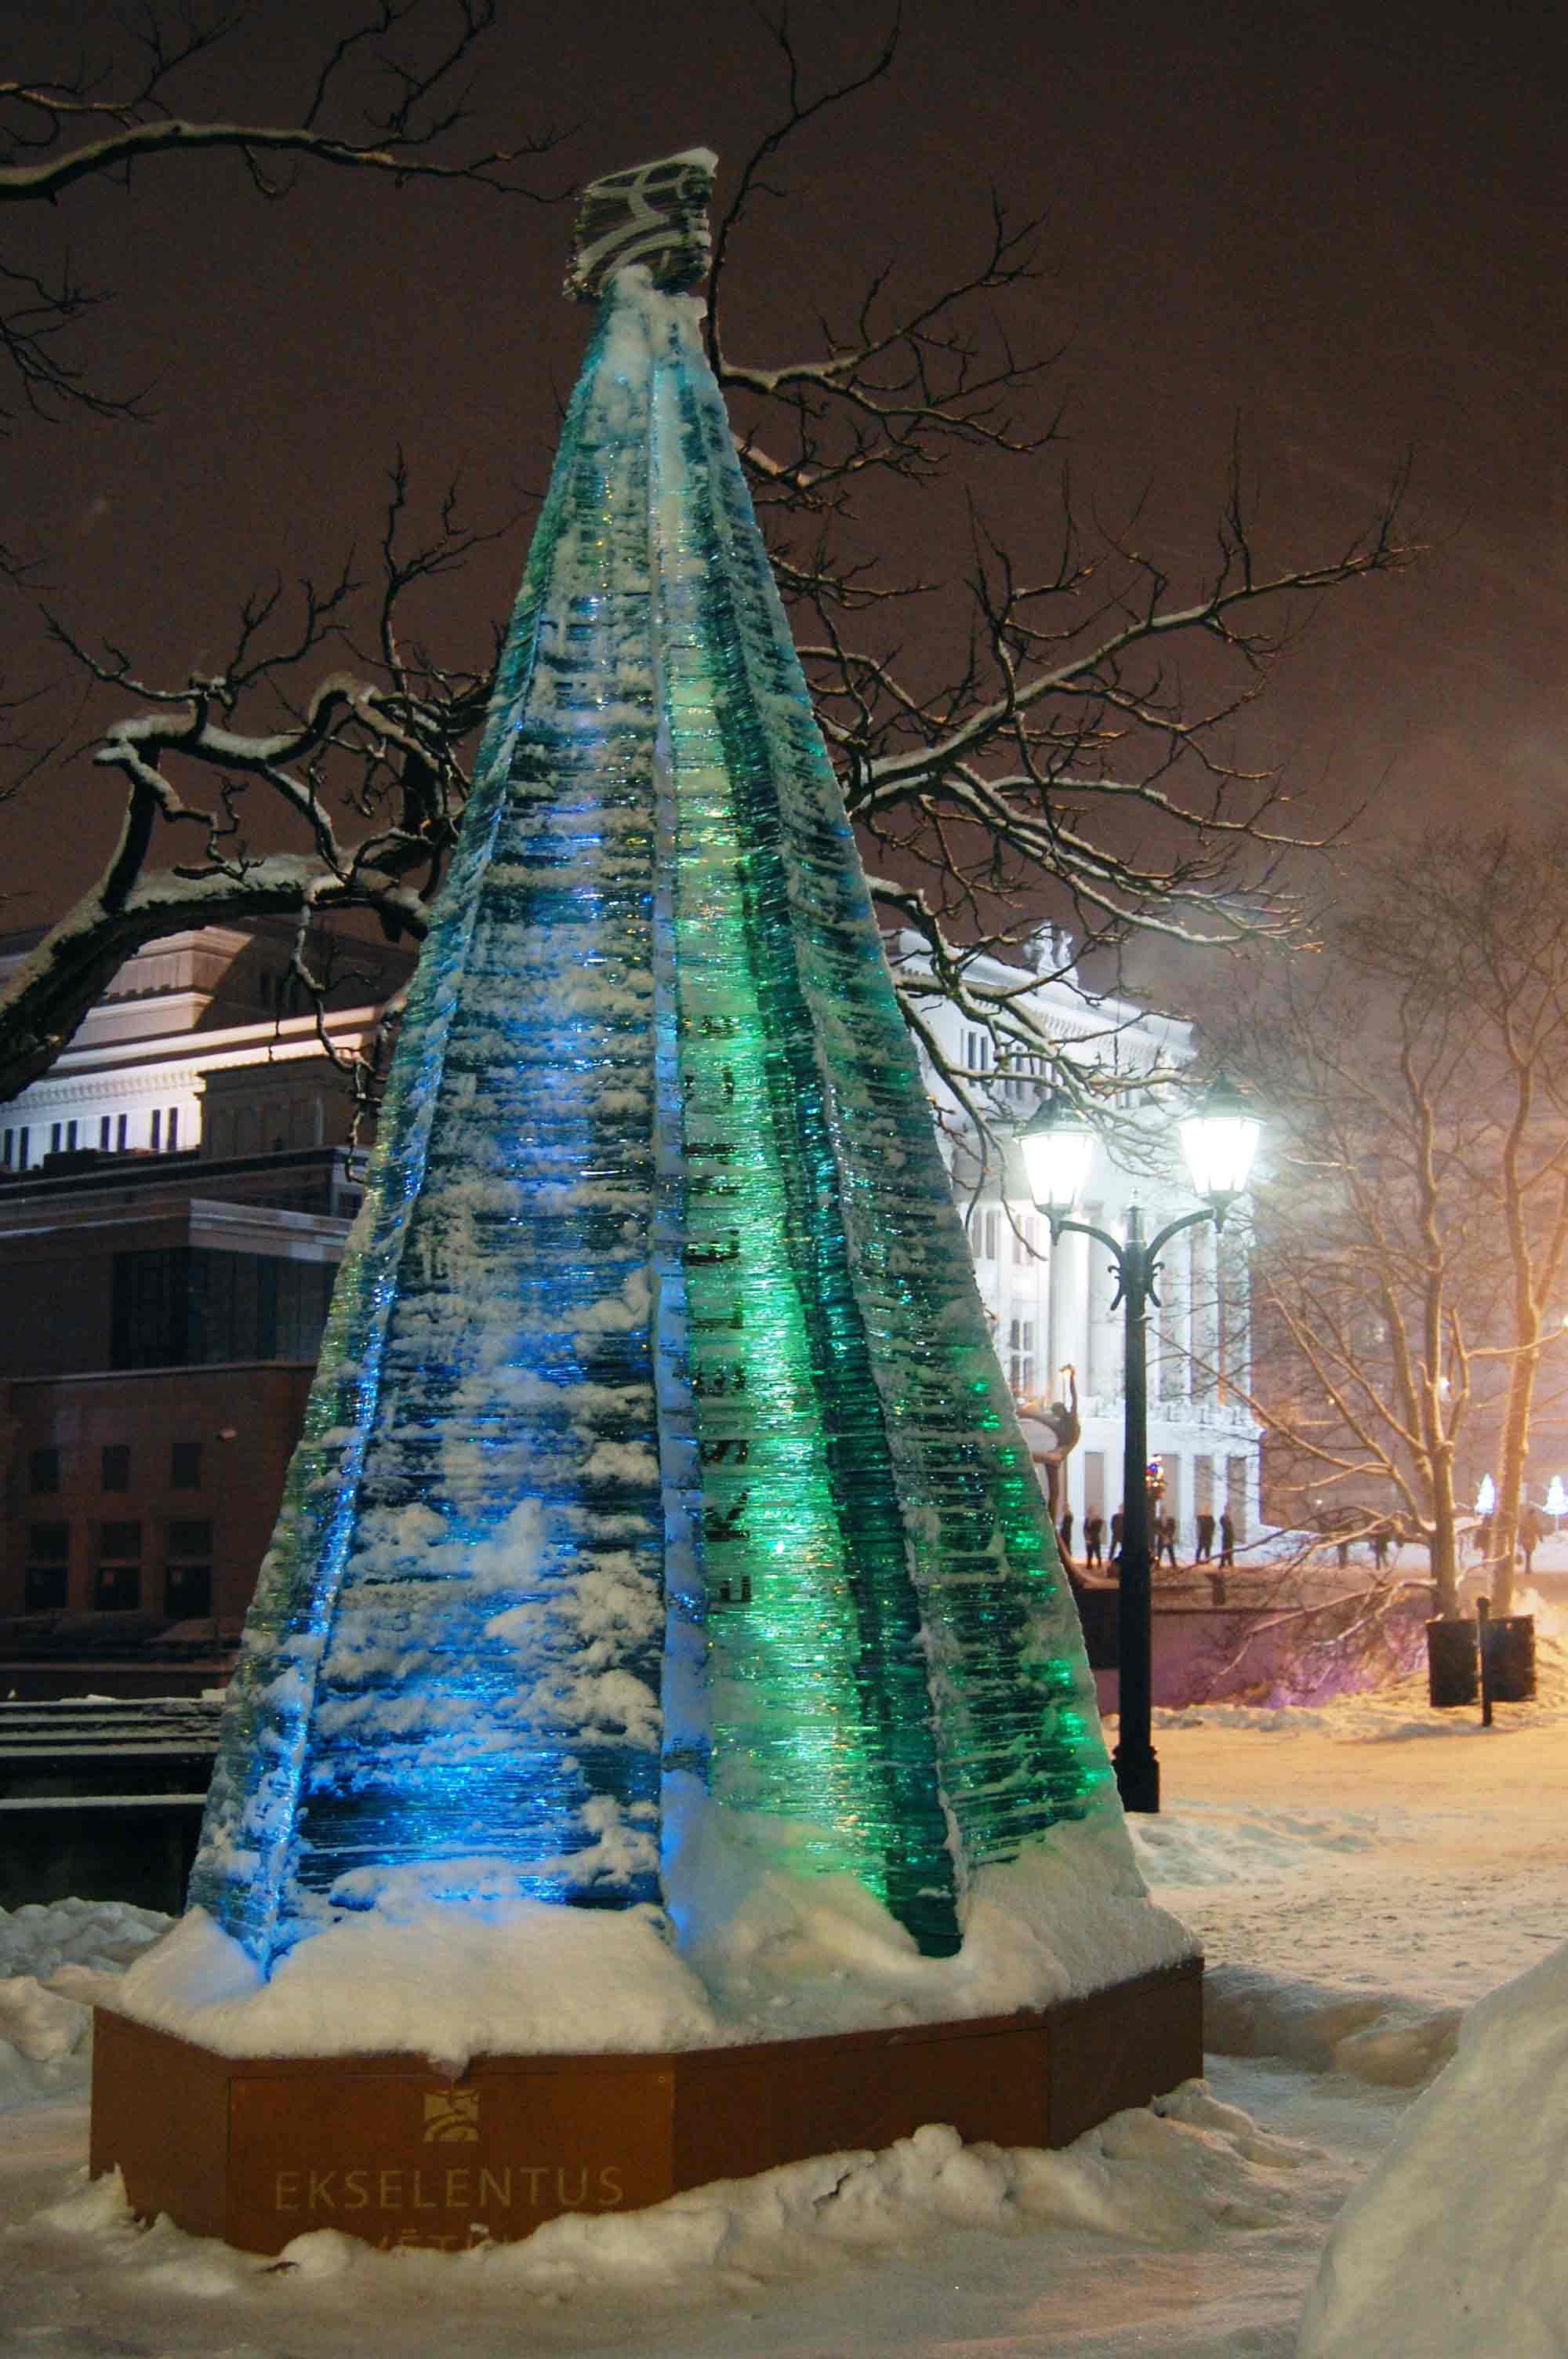 'Ekselence' Stylized Glass Fir Tree